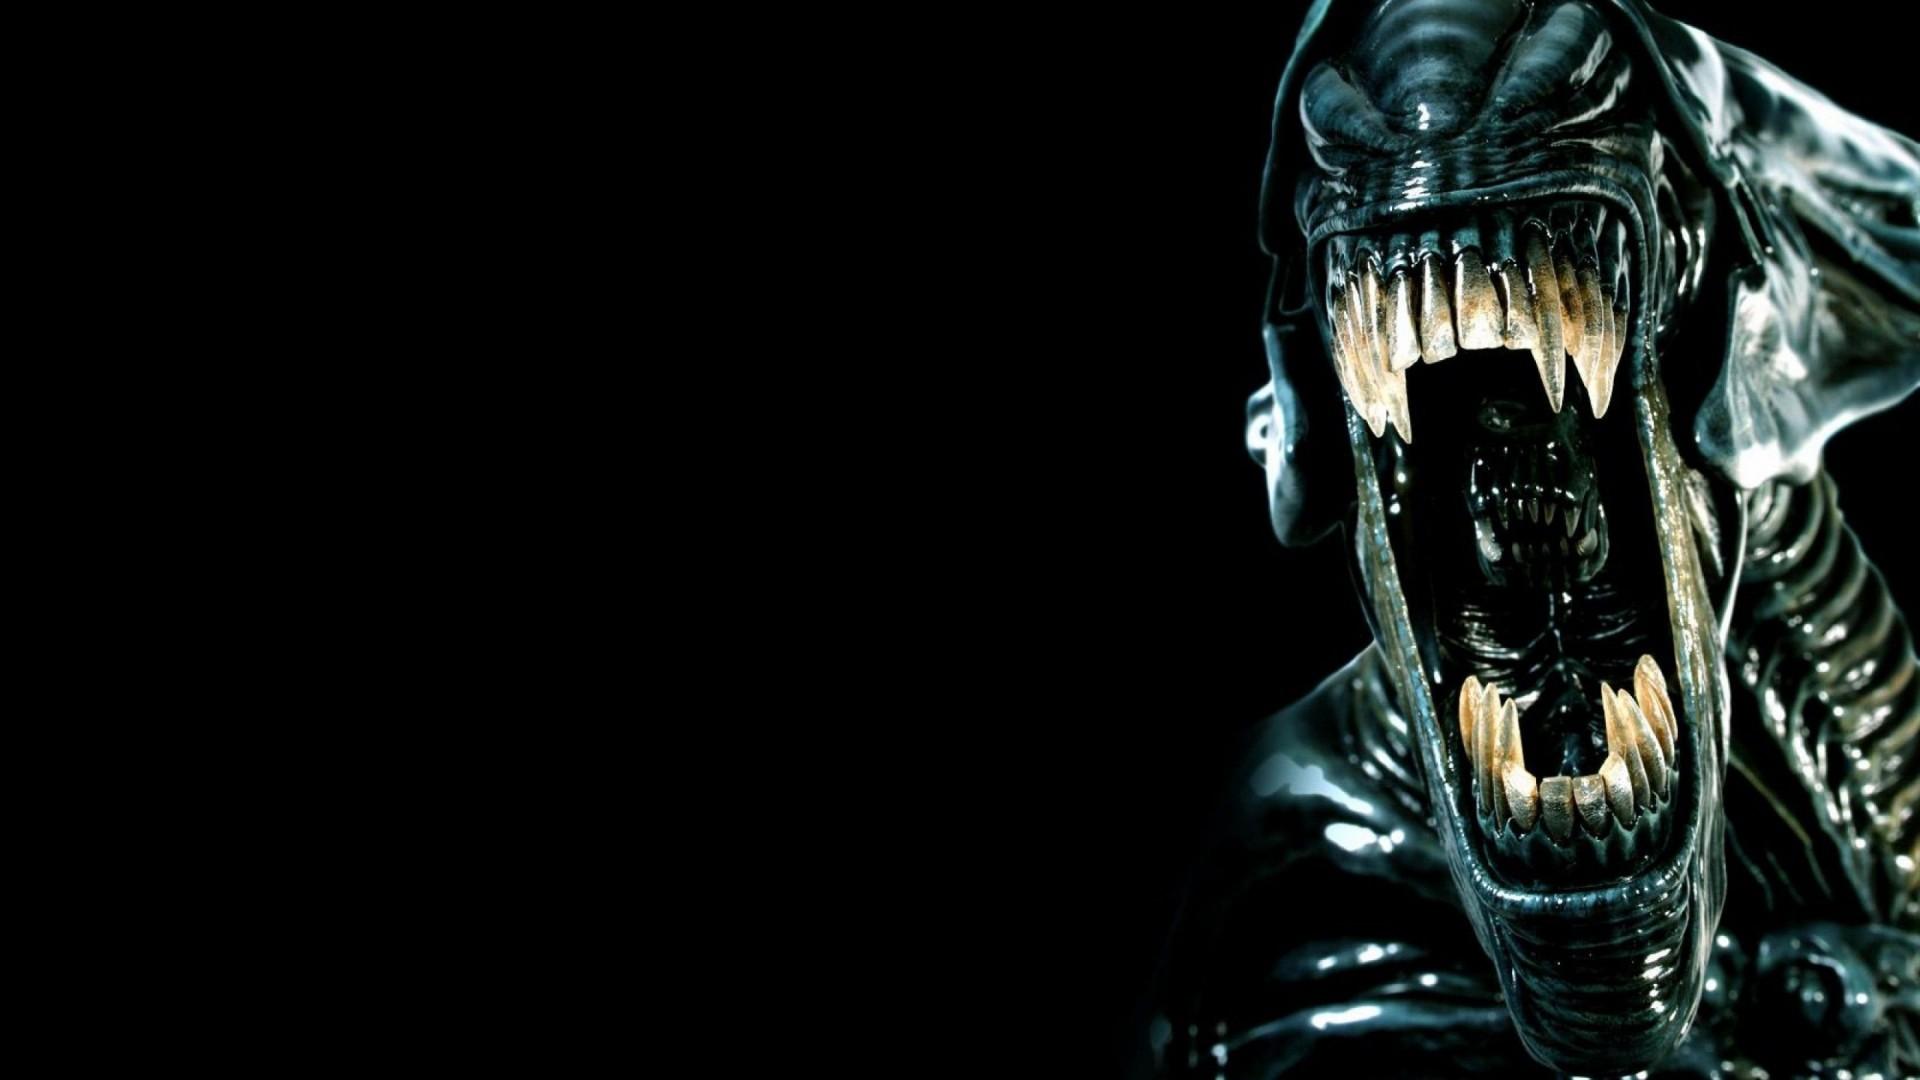 … horror; alien, teeth, horror